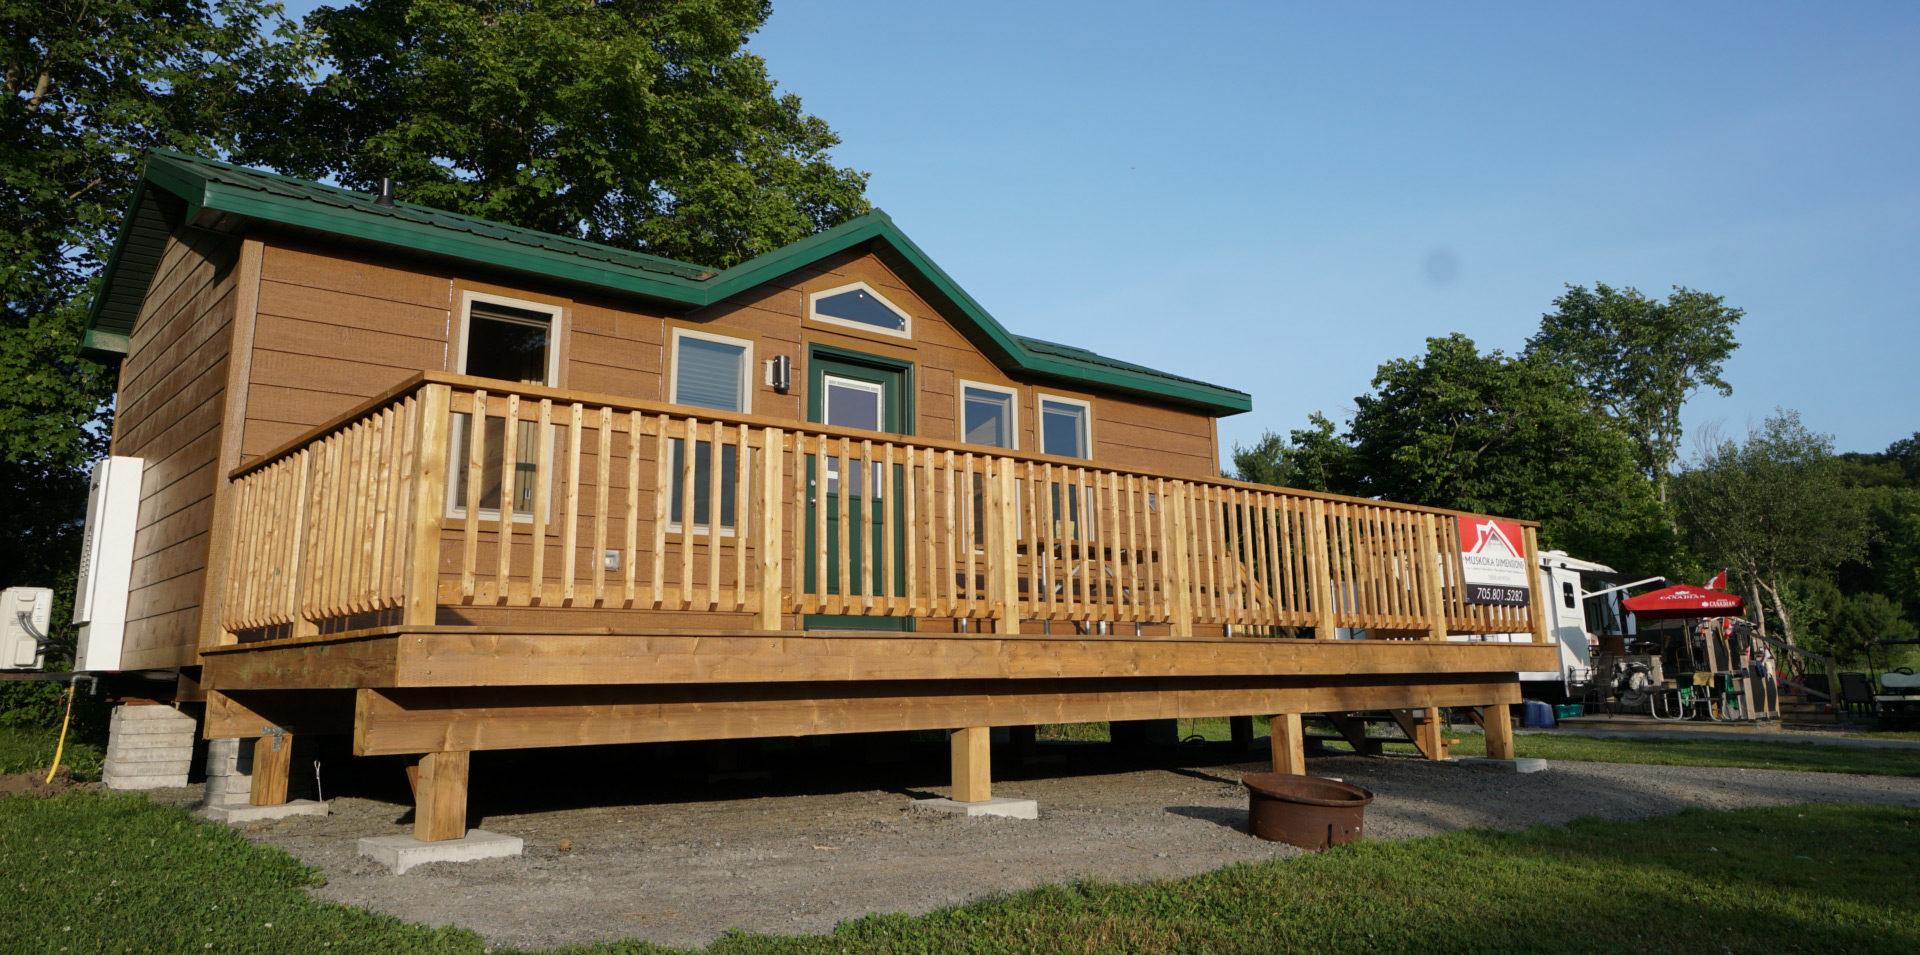 Santa's Muskoka Ridge Campground